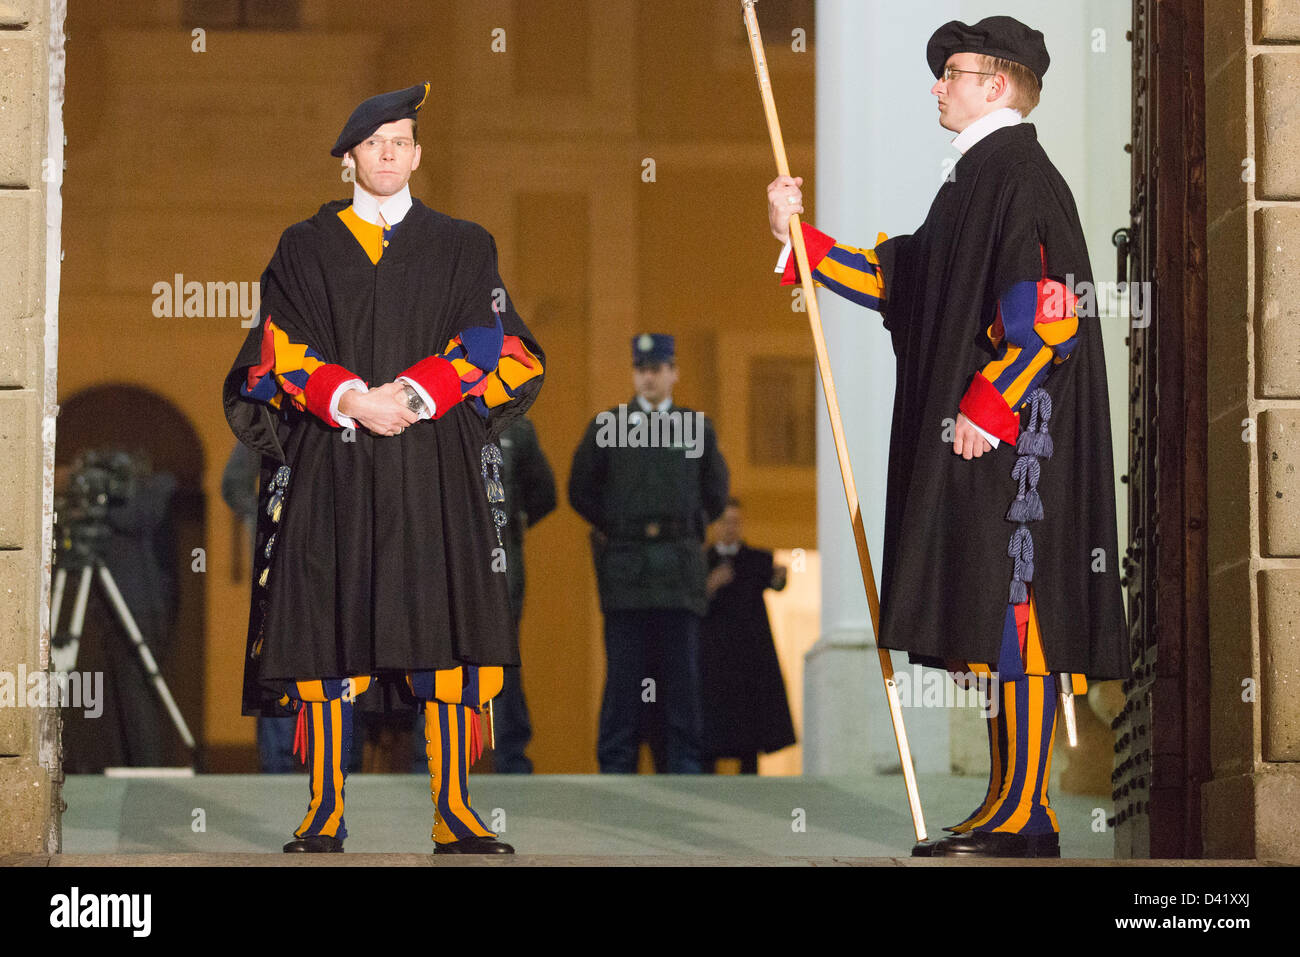 Swiss Guards guard the gate of the apostolic palace in Castel Gandolfo, Italy, 28 February 2013. Pope Benedict XVI - Stock Image